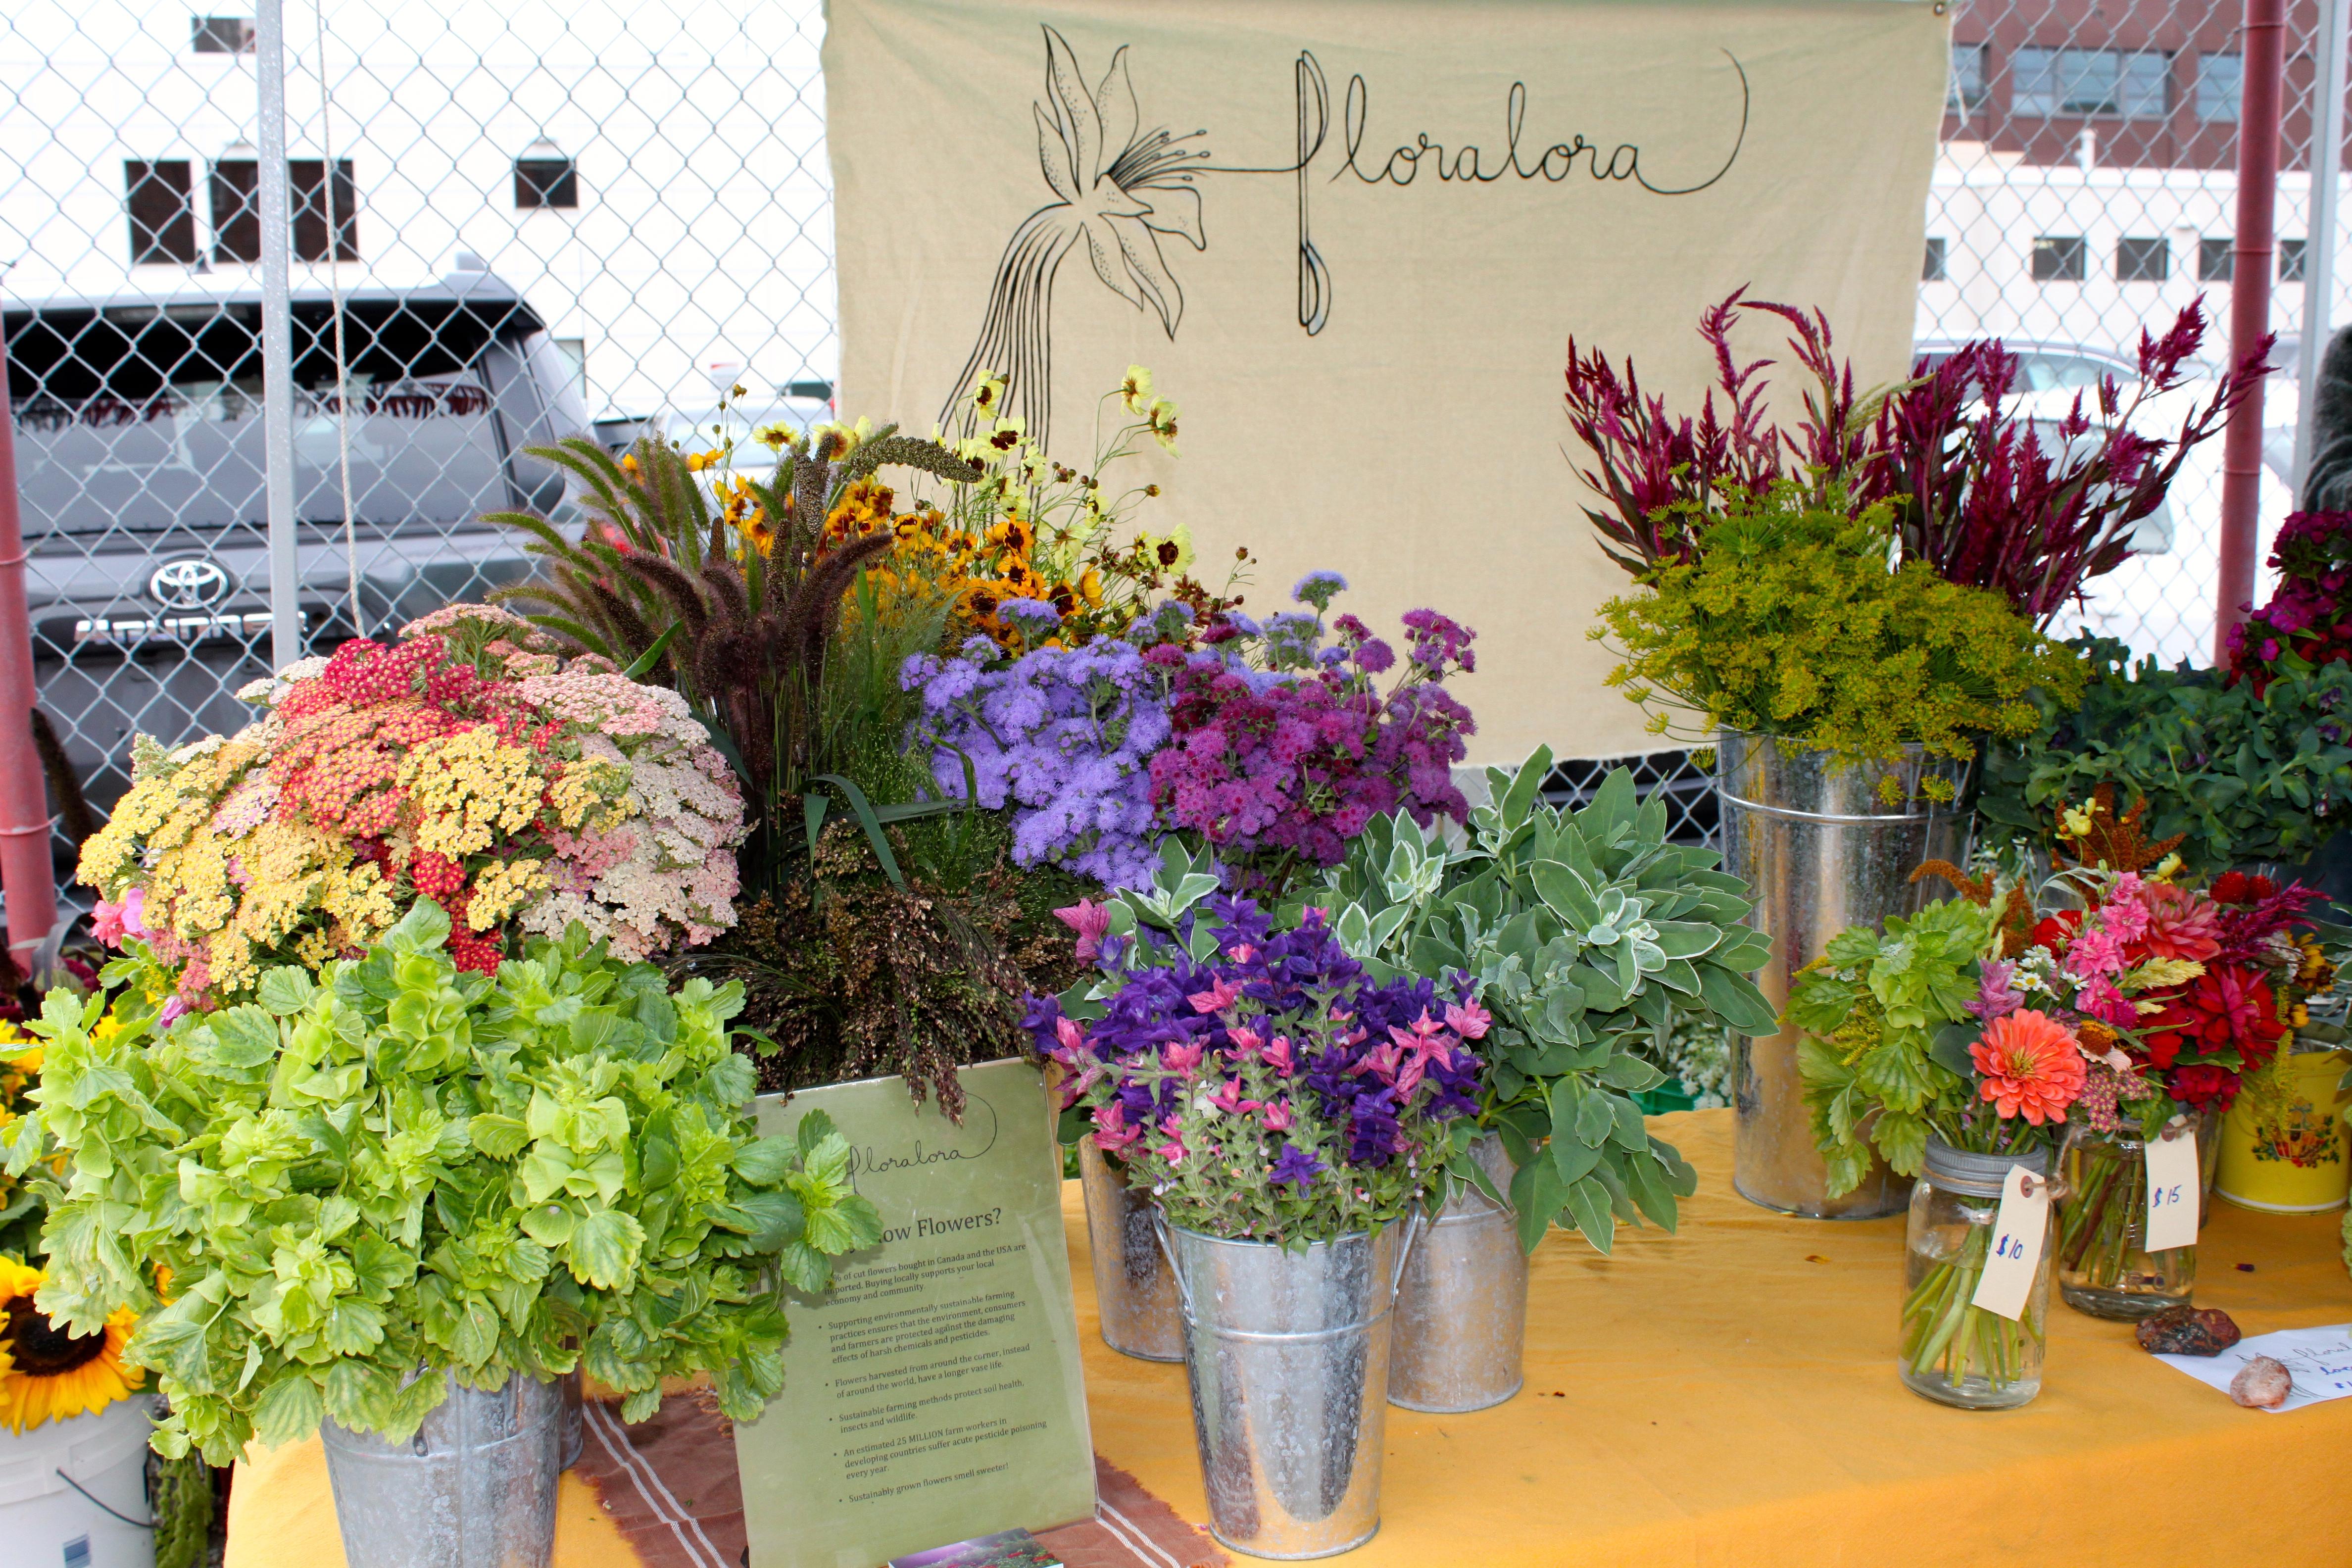 Debra prinzing post episode 366 the debut of canadian flowers flowers from floralora a slow flowers member based in ontario on display at toronto flower market izmirmasajfo